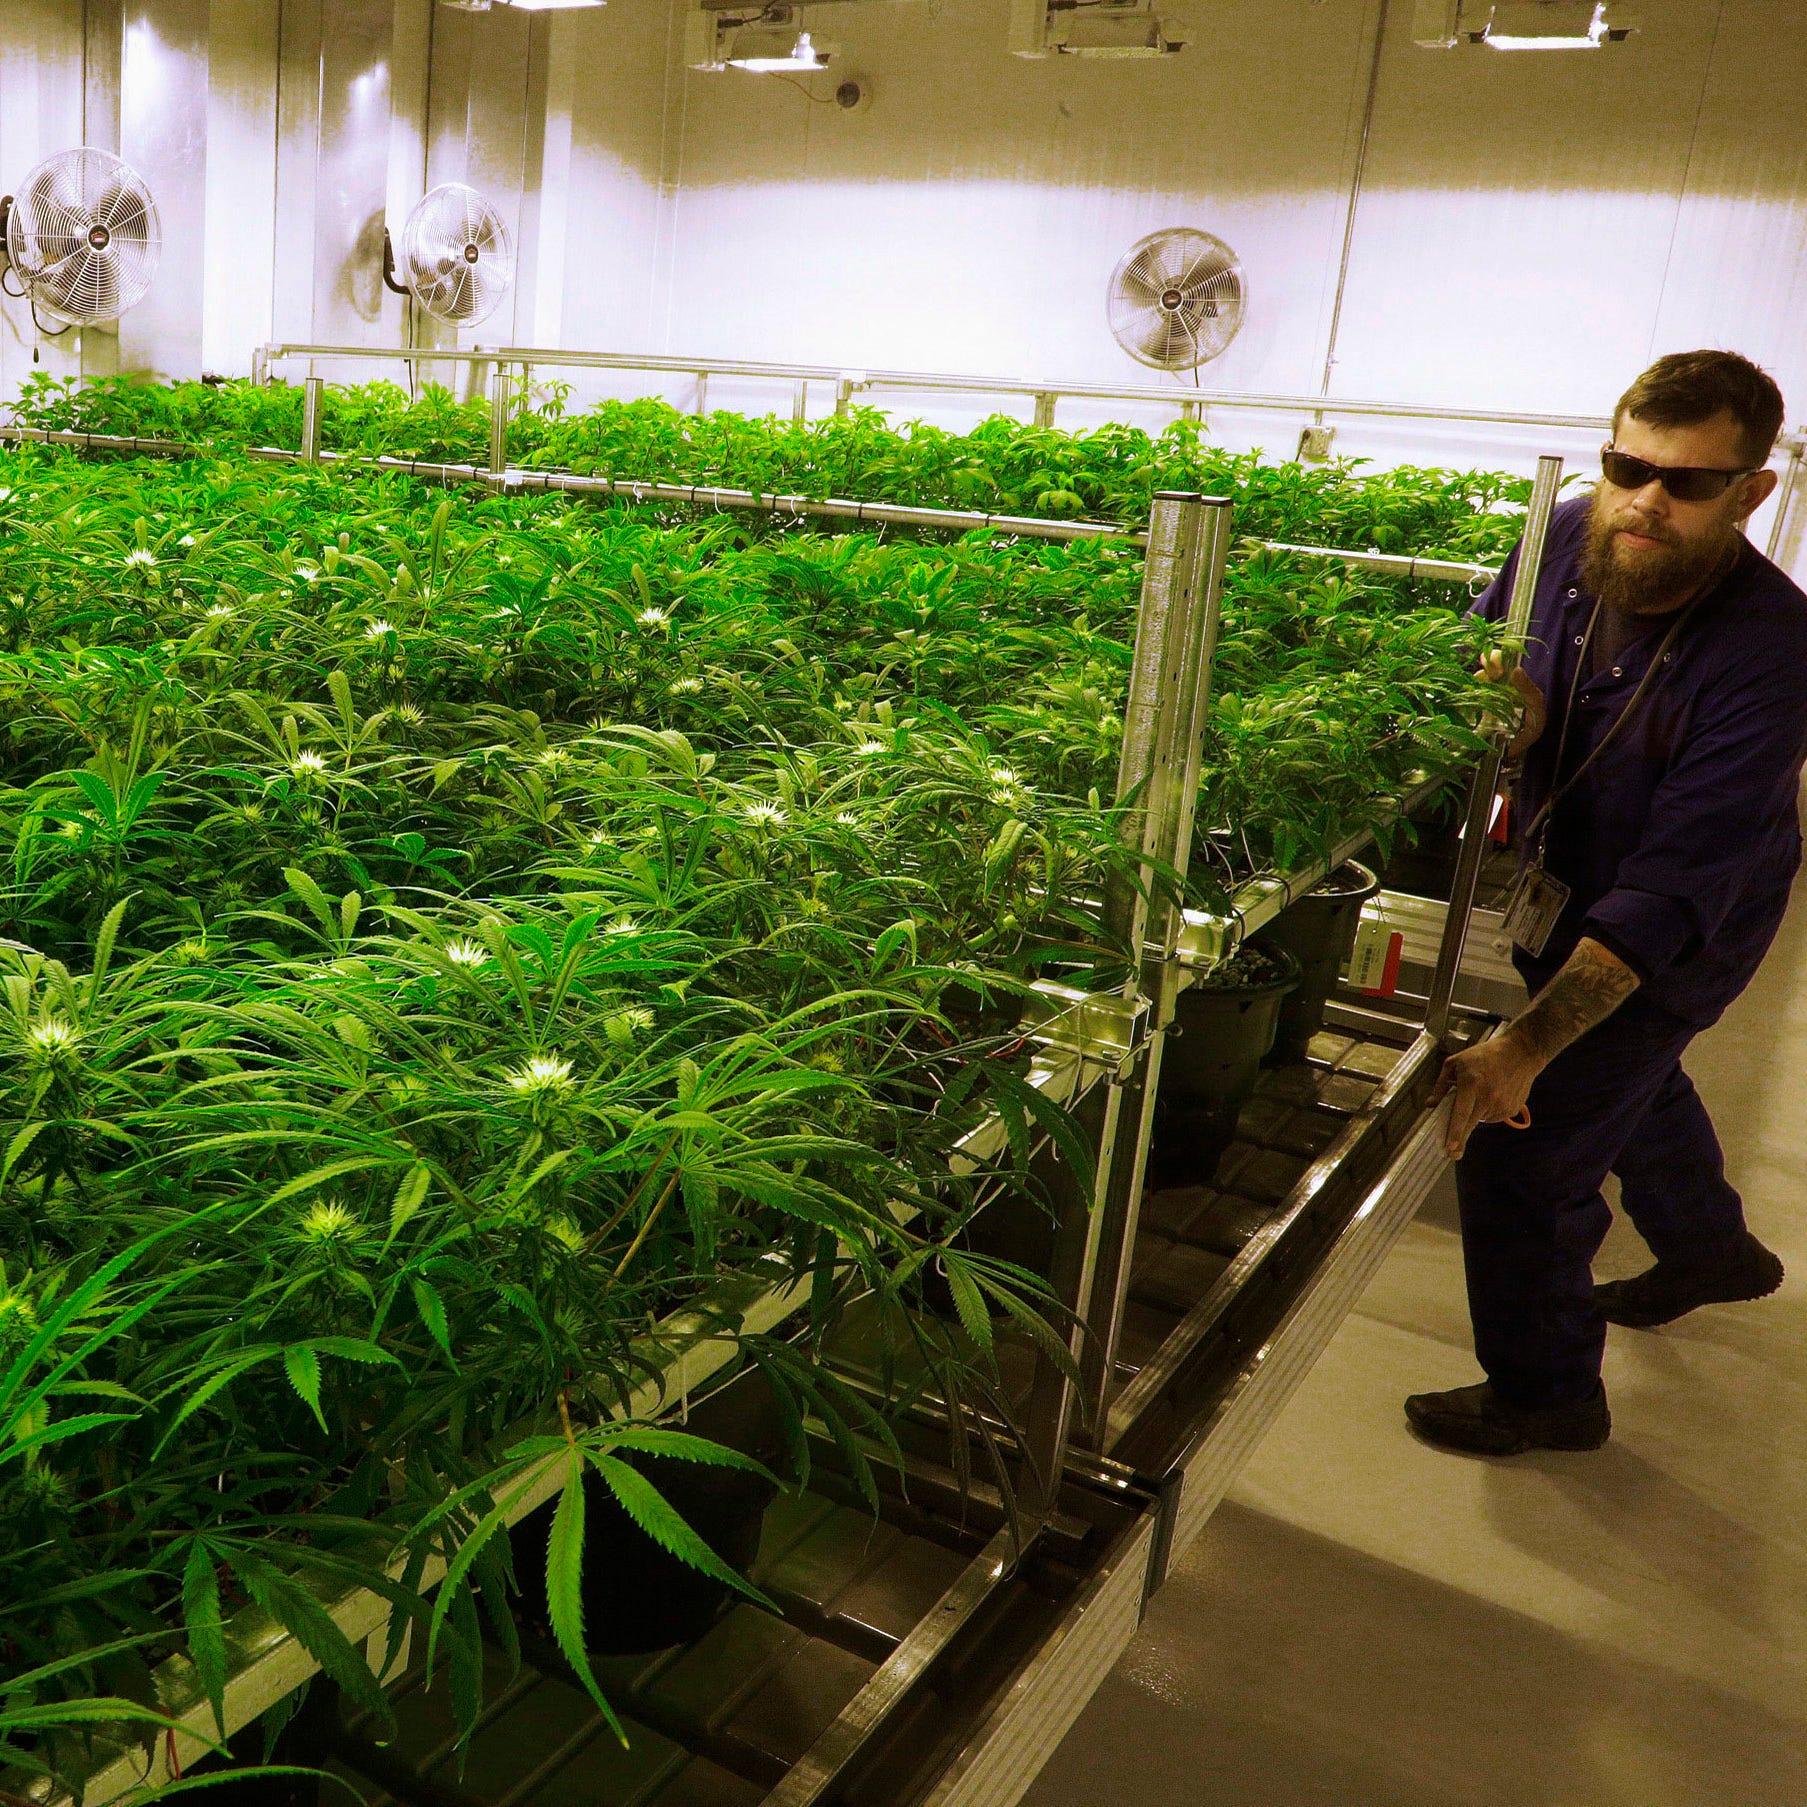 Opinion: Americans must understand marijuana danger